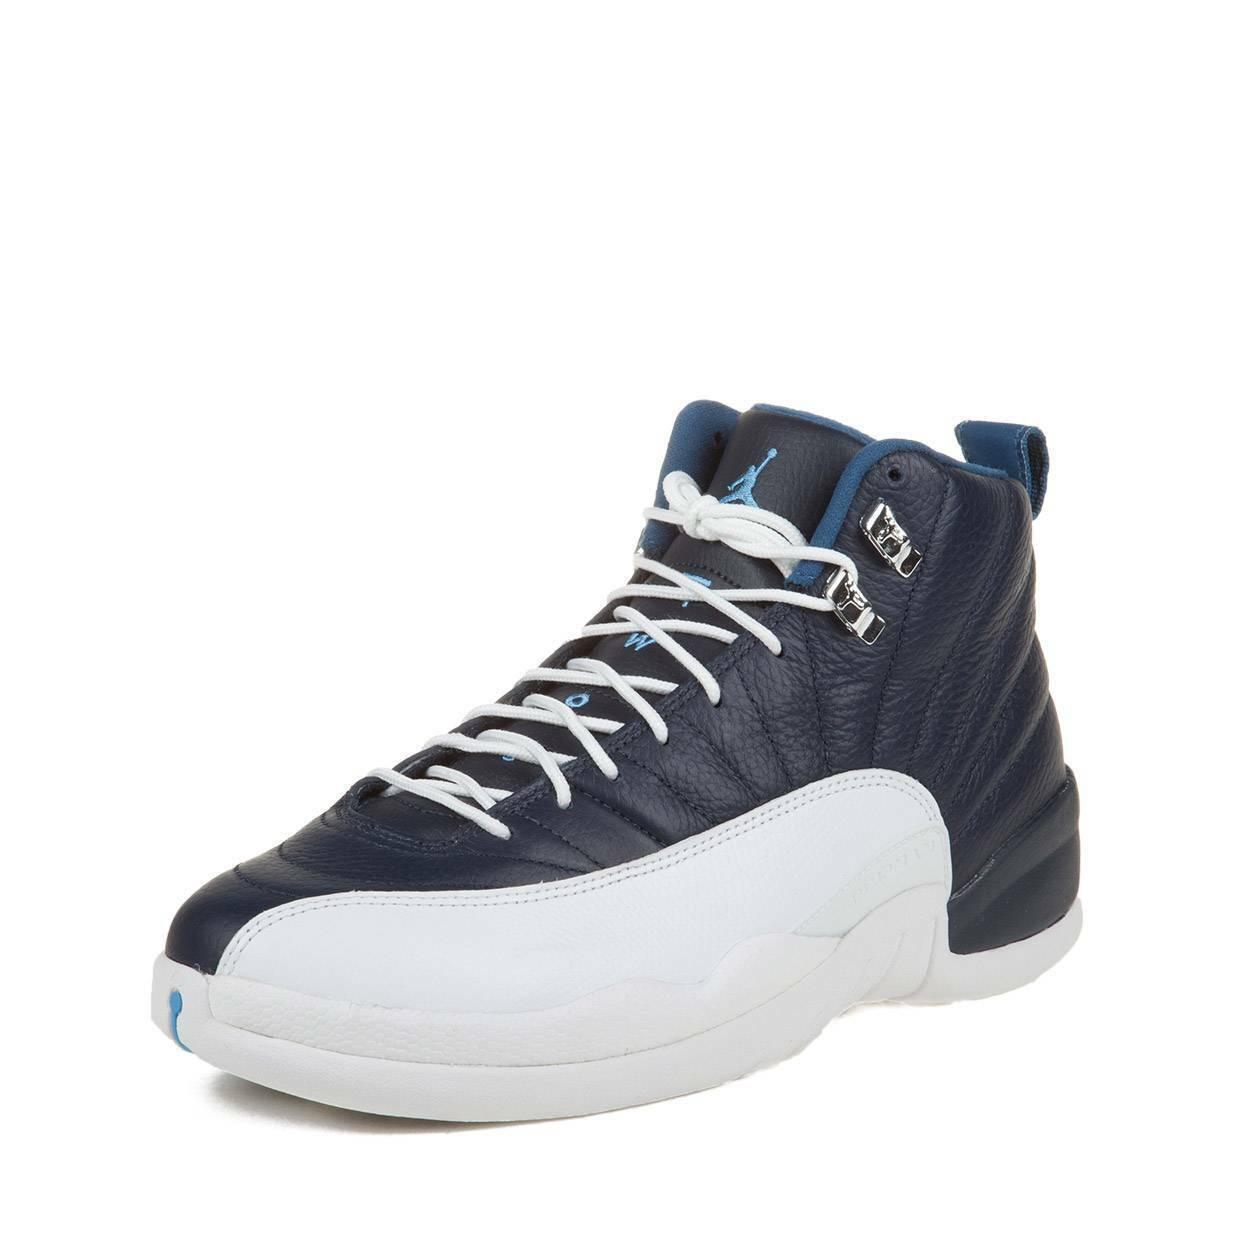 online store 56d4a 0749c Nike Mens Mens Mens Air Jordan 12 Retro Obsidian University bluee 130690-410  Size 10